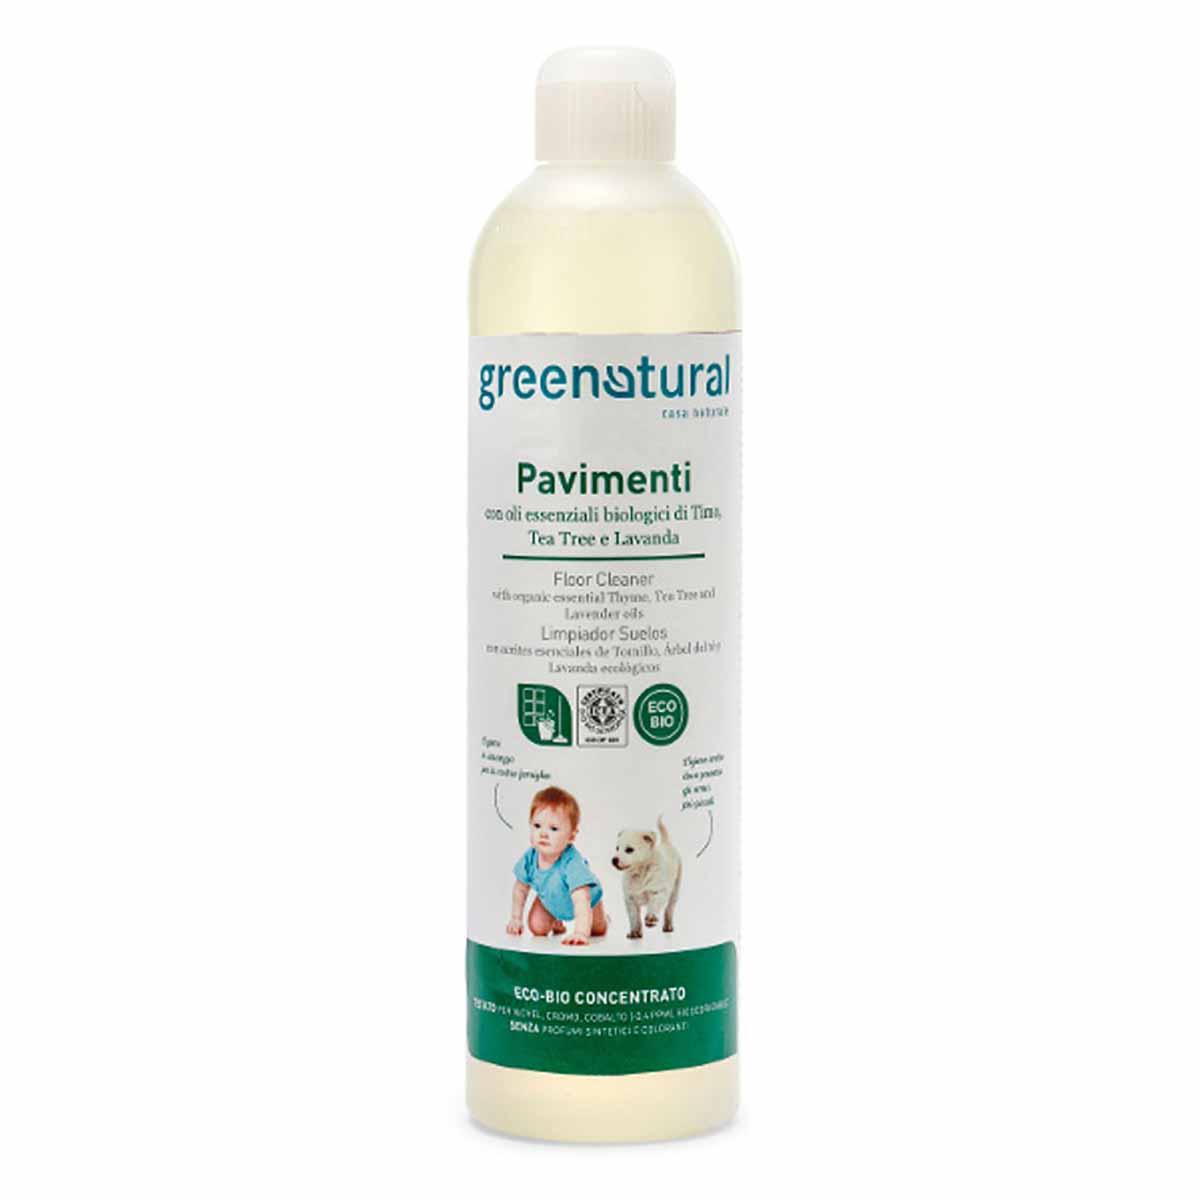 Greenatural – Detergente Pavimenti Timo, Tea Tree & Lavanda